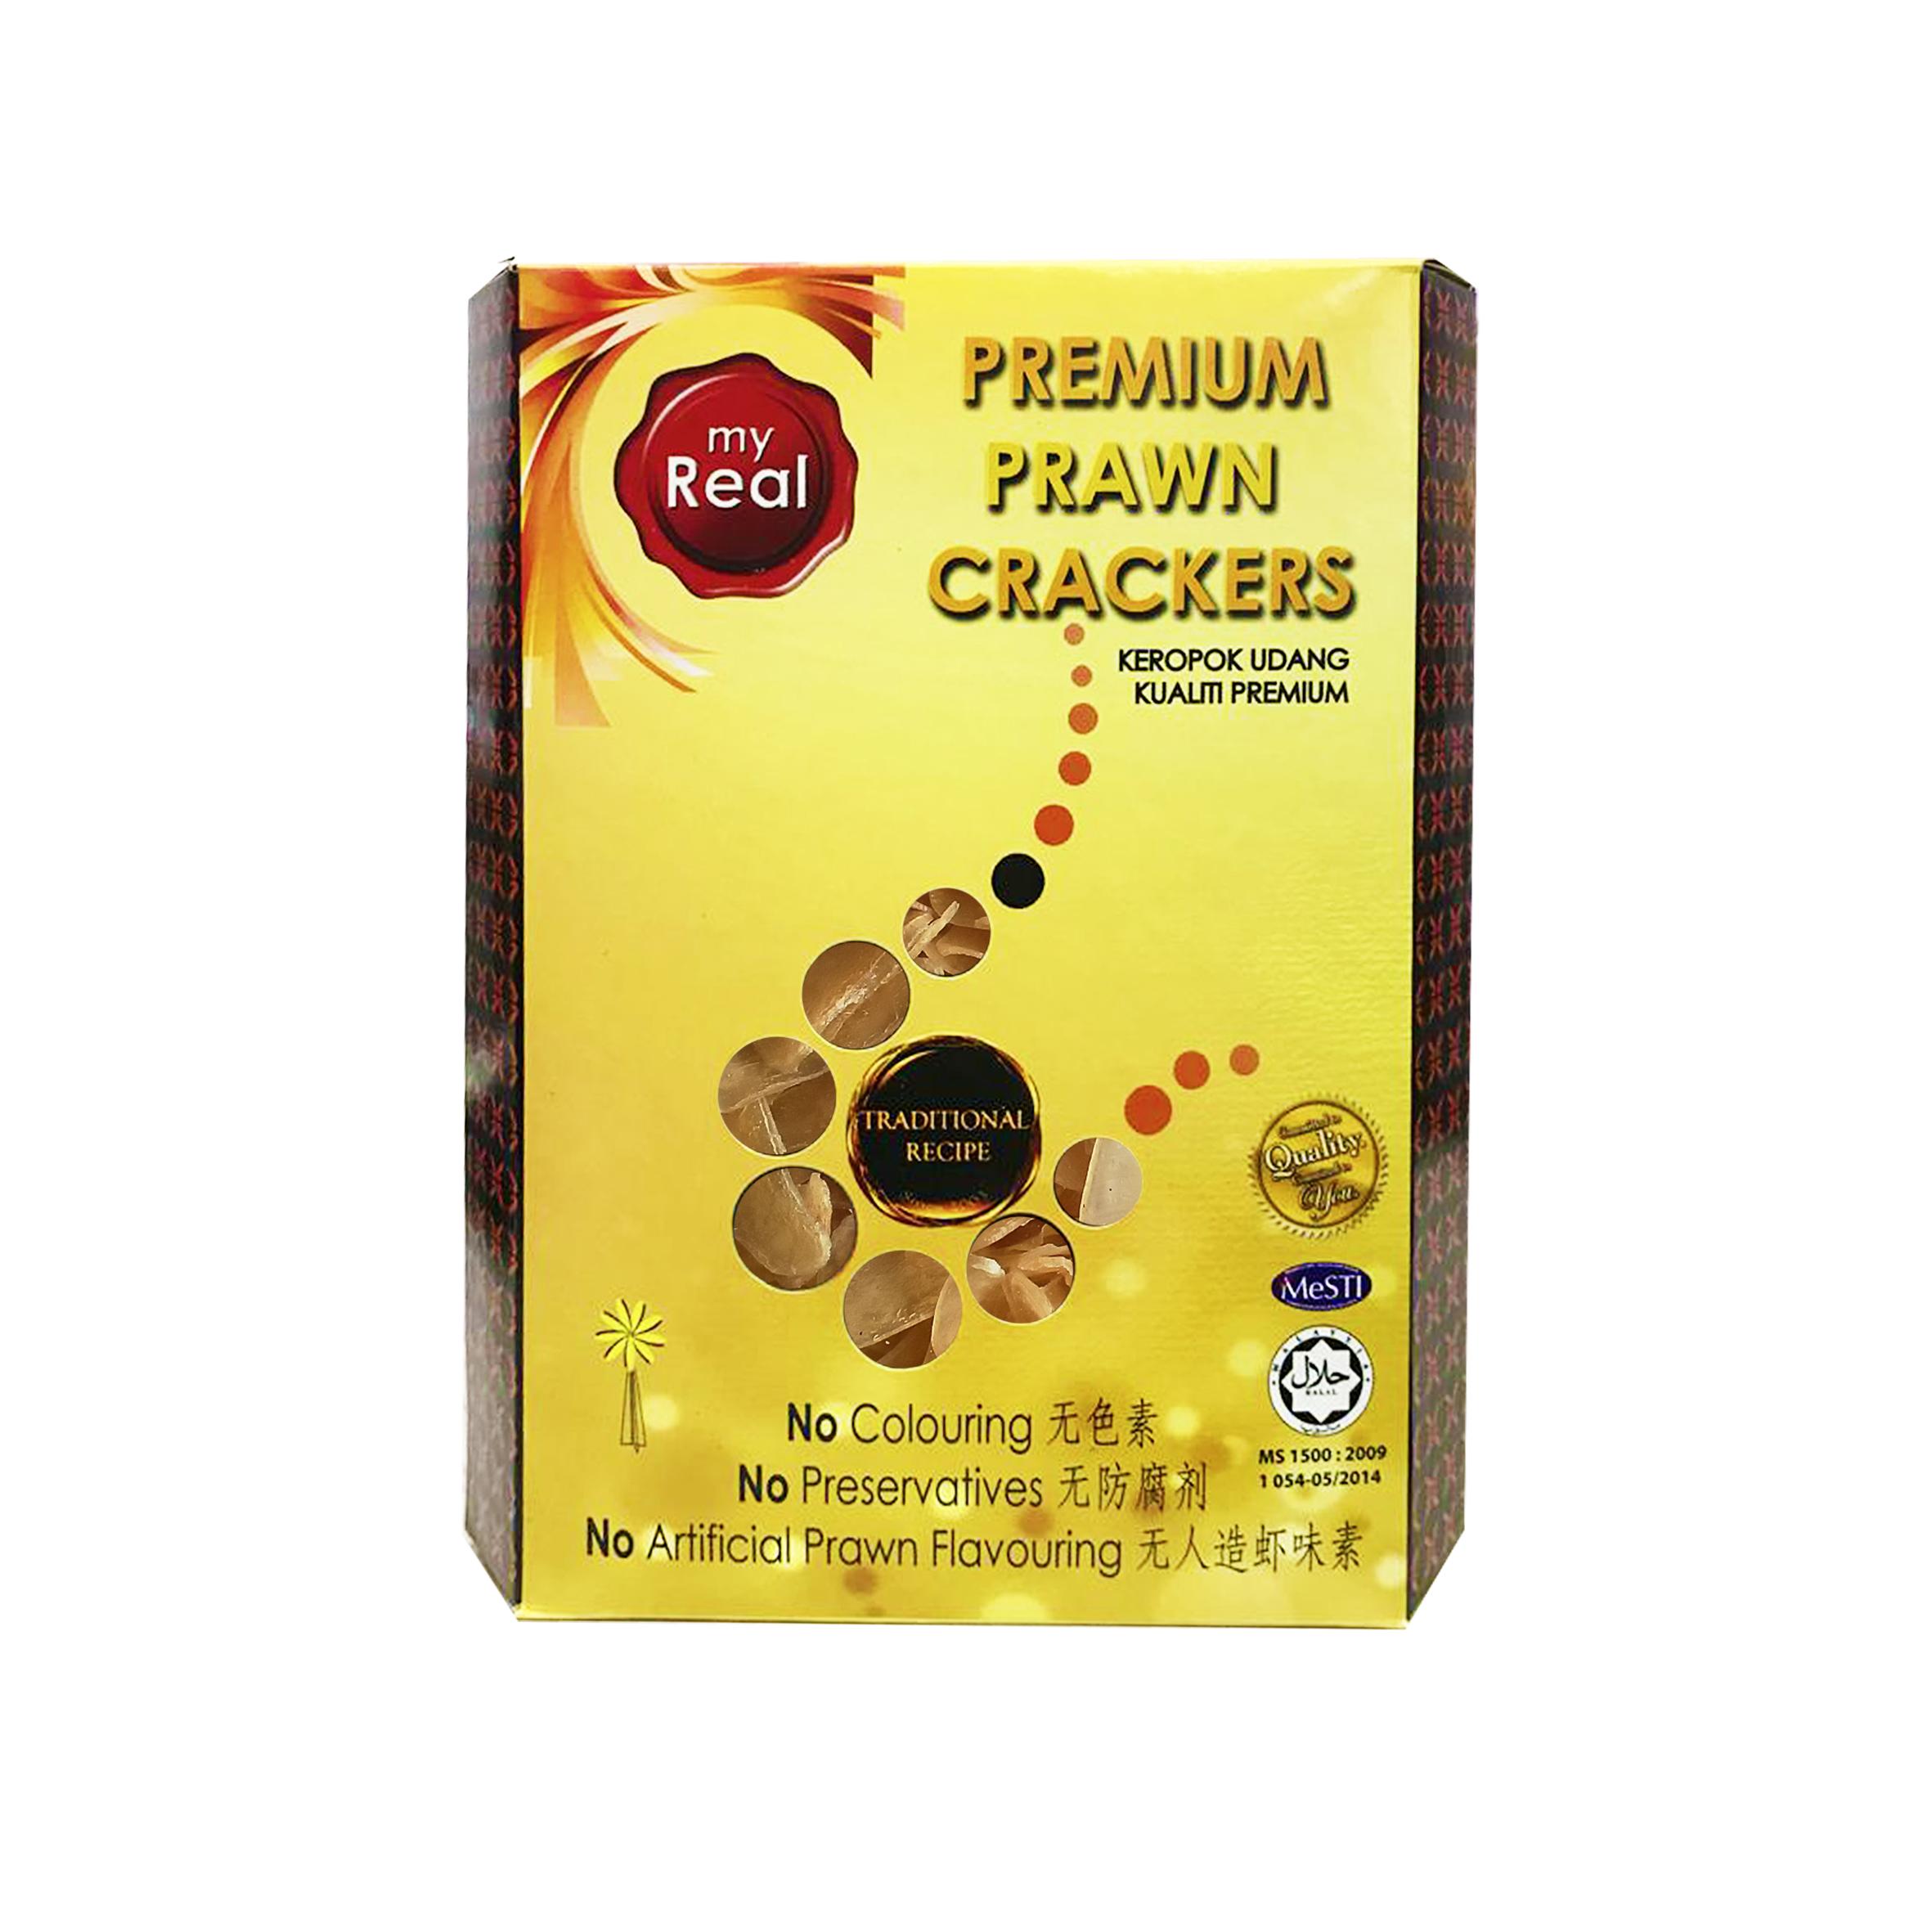 myReal Premium Prawn Crackers Slice 360g (Dried)